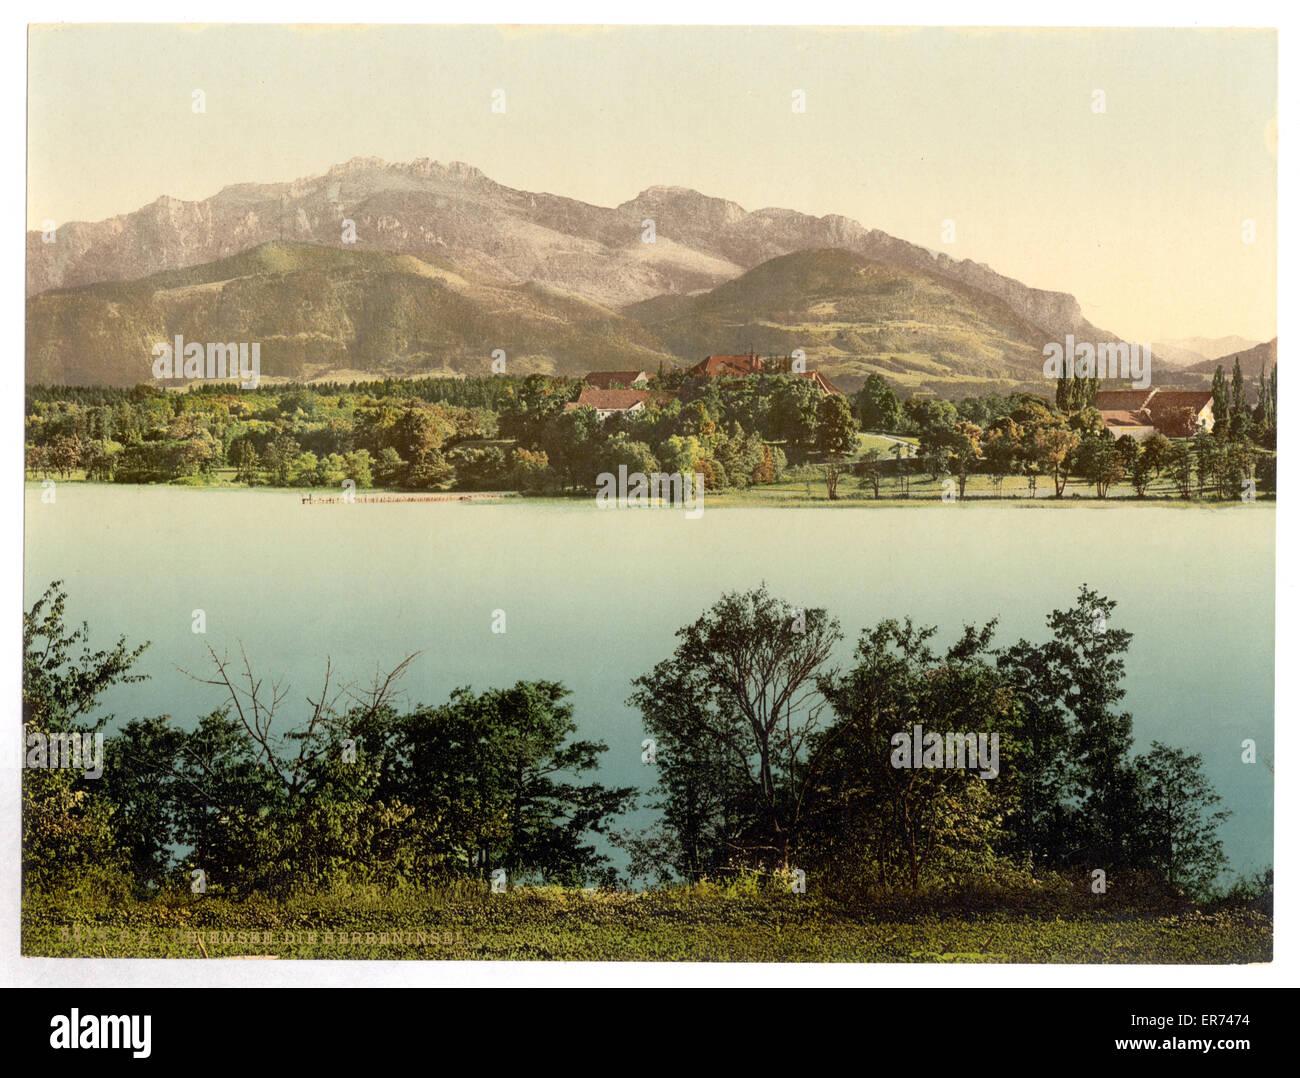 Herreninsel, Chiemsee, Upper Bavaria, Germany. Date between ca. 1890 and ca. 1900. - Stock Image